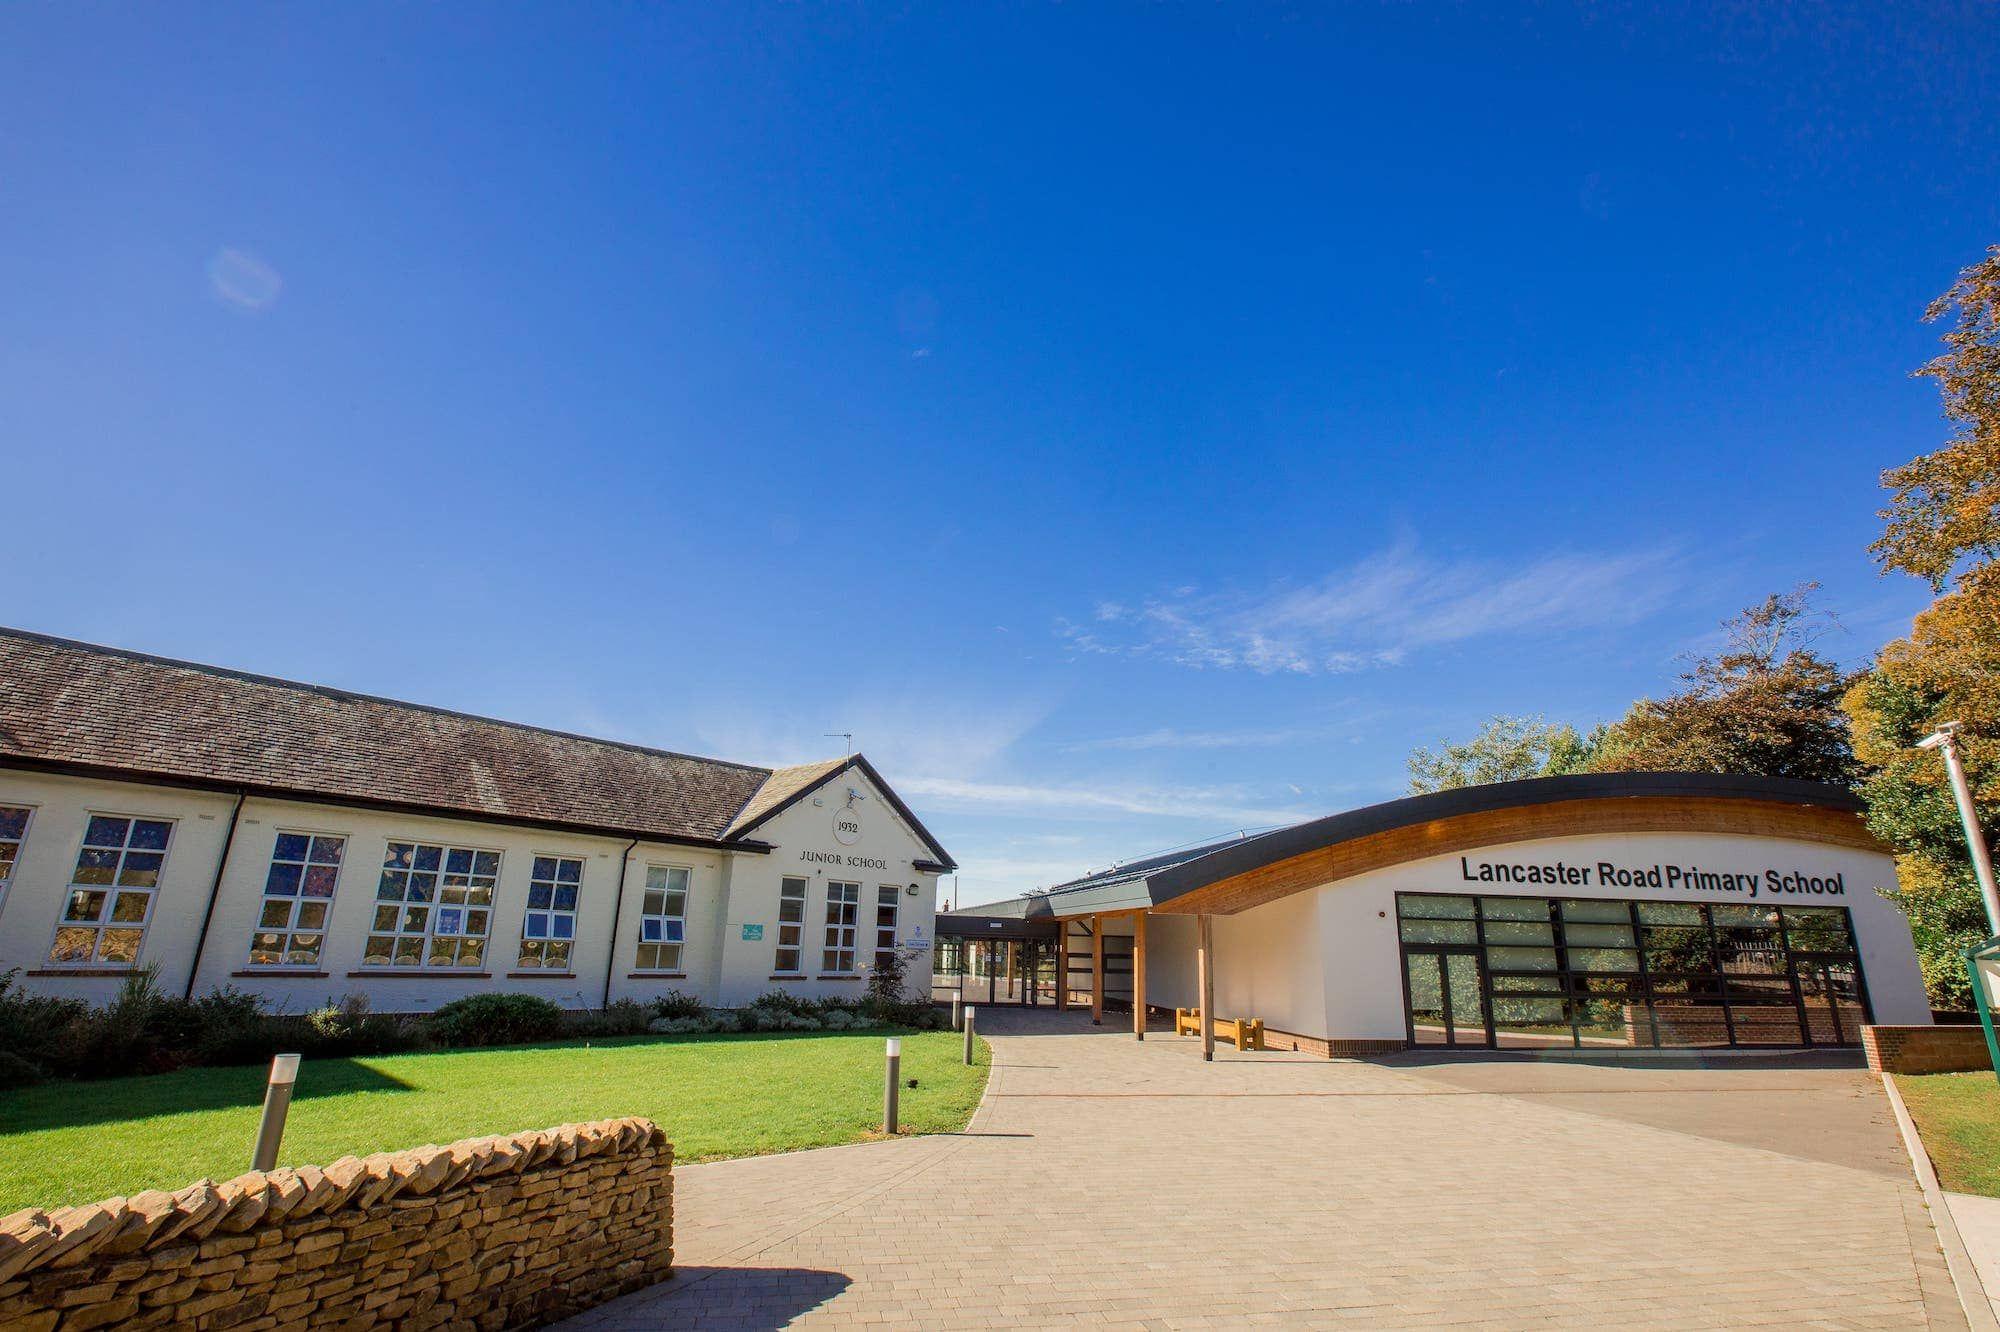 Lancaster Road Primary School